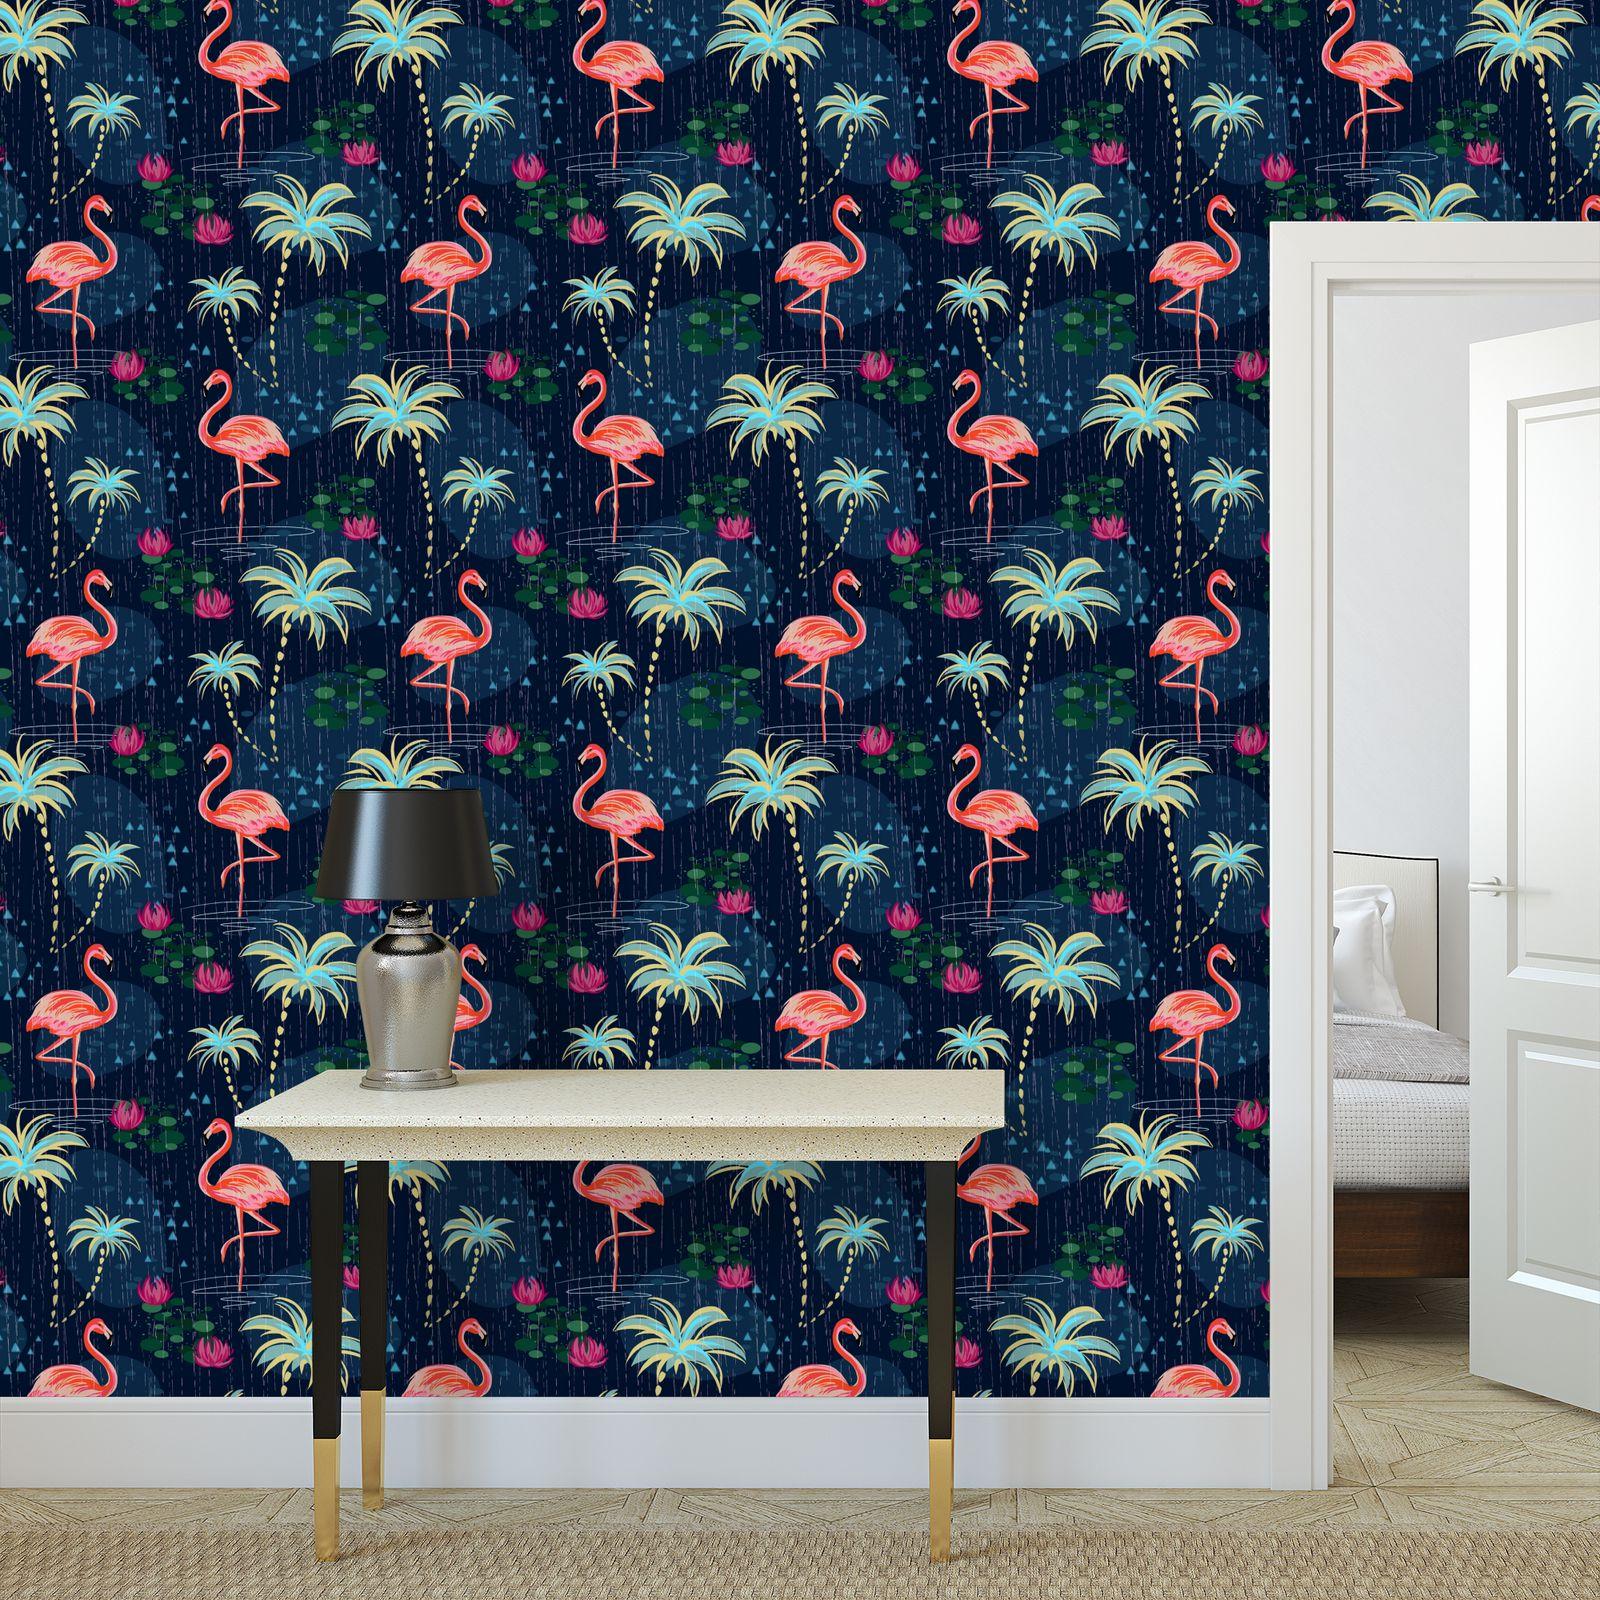 Pink flamingo - Wallpaper Rolls - tropical rain, palms, dark blue, navy, exotic, Bohemian, whimsical, resort, beach, bright, jungle, travel - design by Tiana Lofd